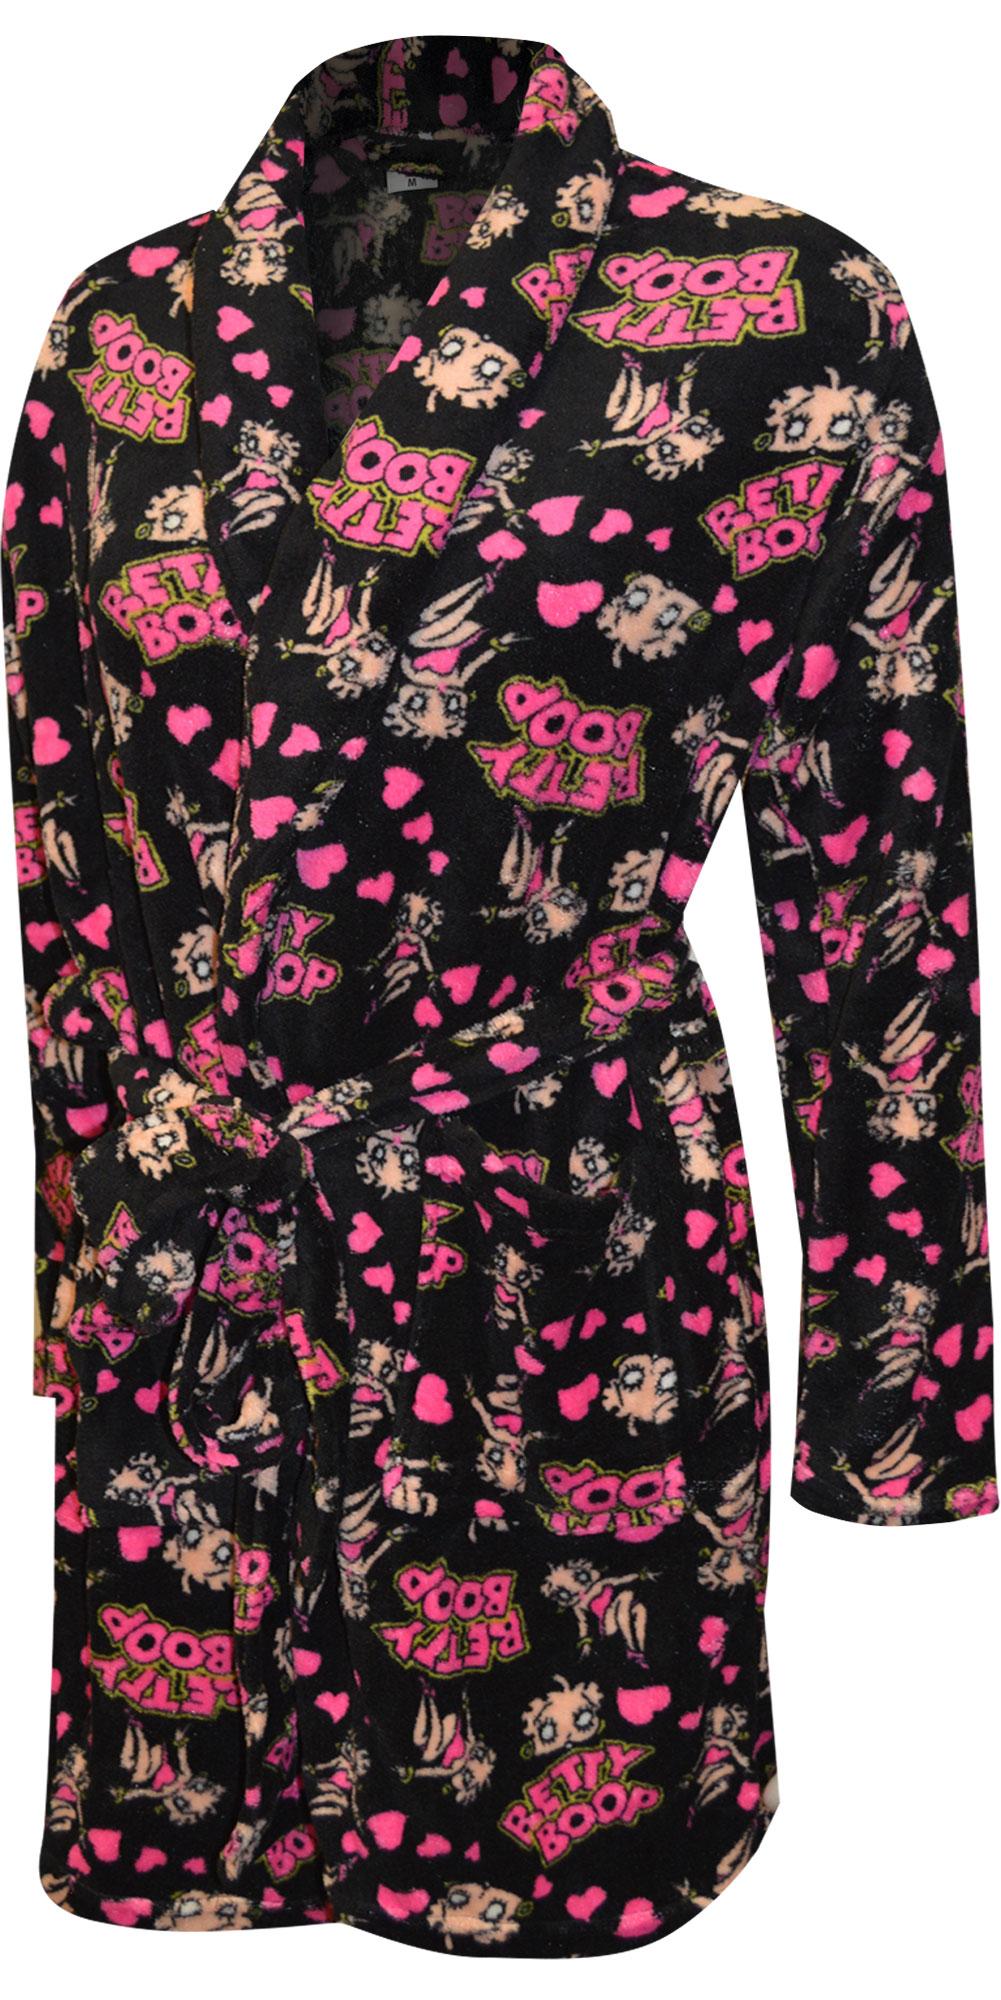 Image of Betty Boop Black Super Soft Plush Robe for women